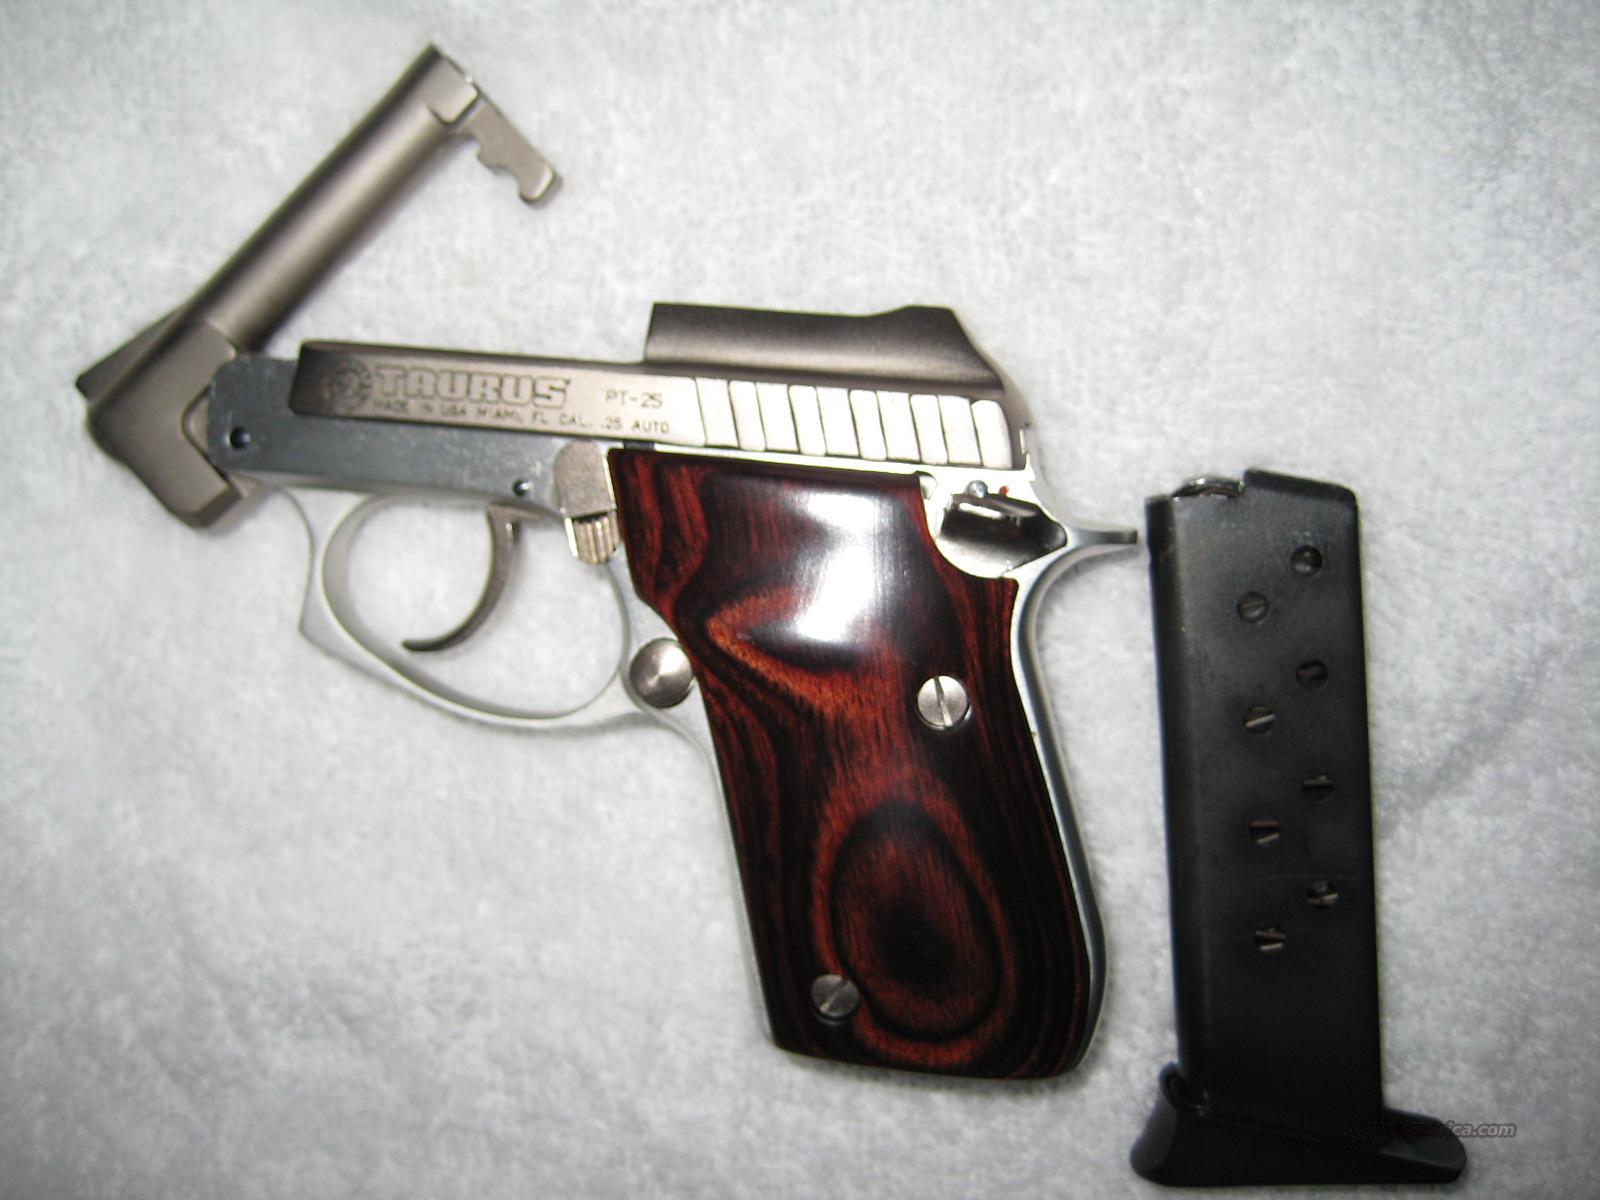 .25ACP TAURUS PT-25 NEW 9 Round  Guns > Pistols > Taurus Pistols/Revolvers > Pistols > Steel Frame